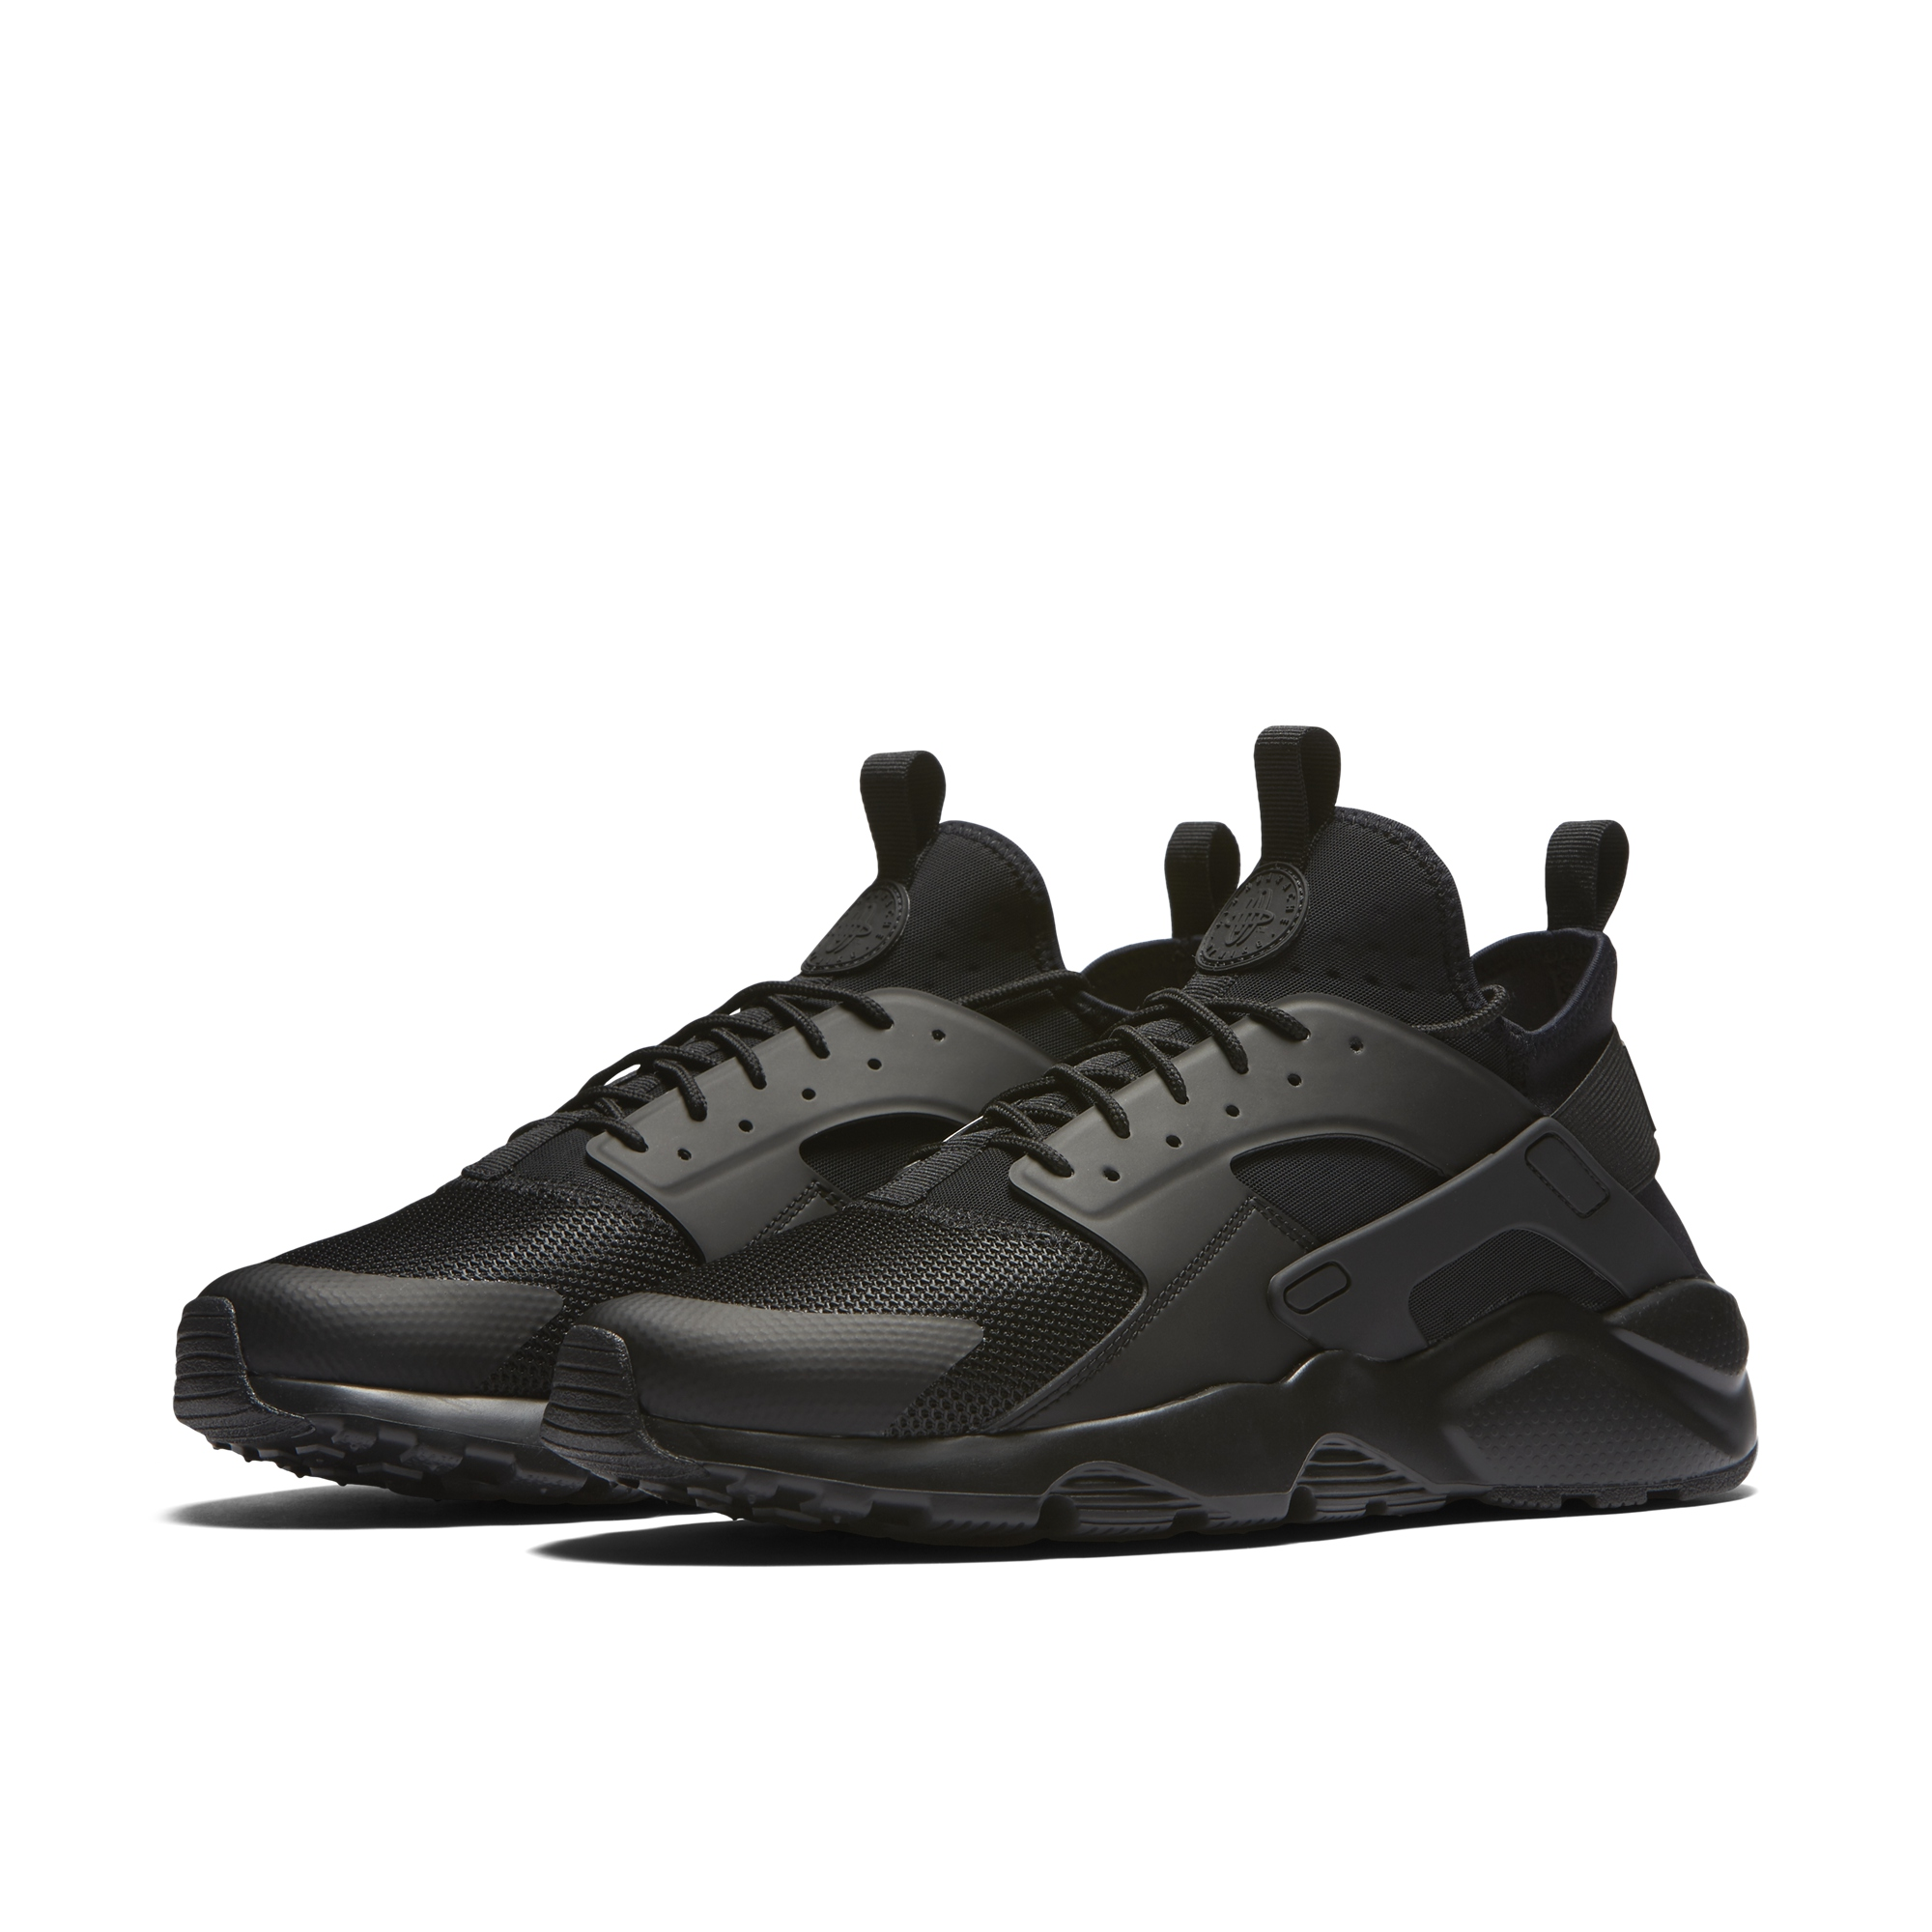 6a73efdb7d1 Original Official NIKE AIR HUARACHE RUN ULTRA Men s Running Shoes Sneakers  819685 Outdoor Ultra Boost Athletic Durable 819685